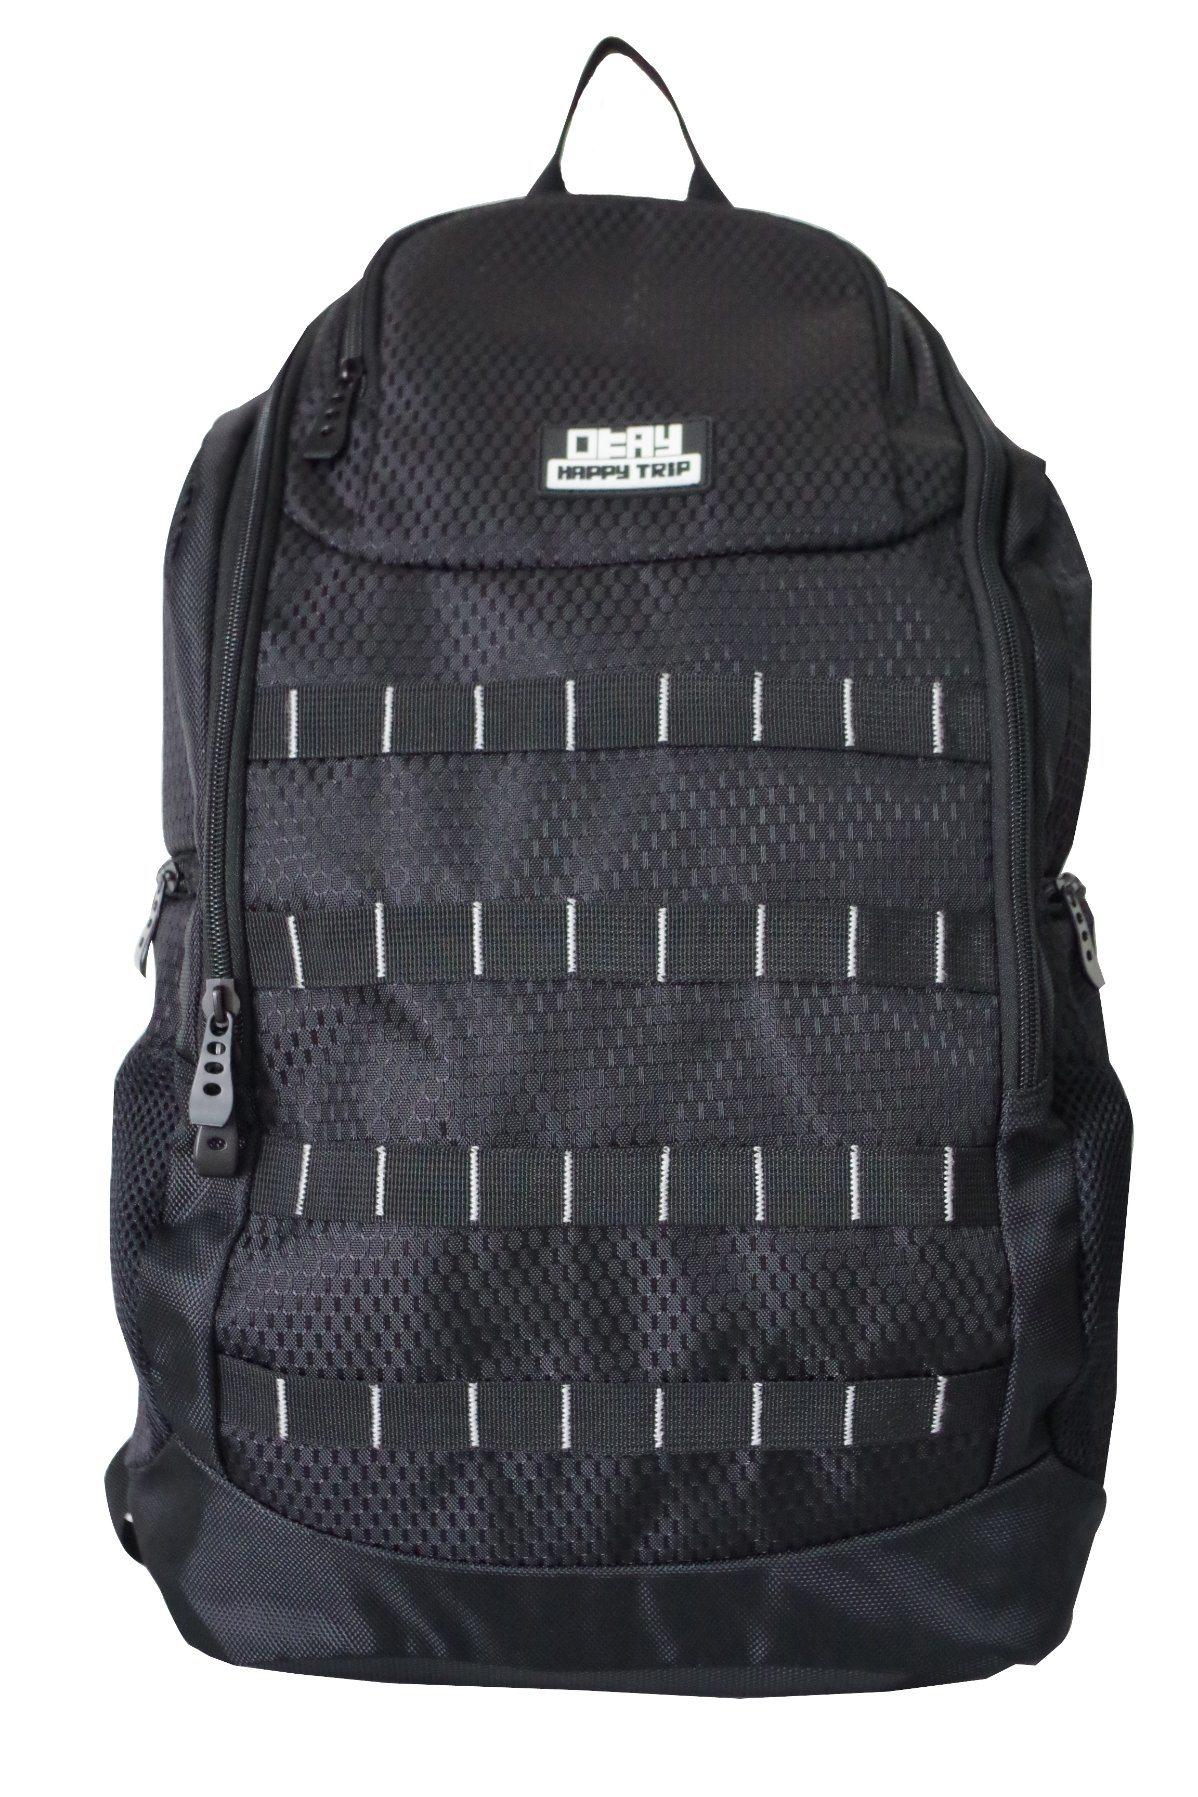 New Fashion Men//Women School Backpack Casual Sports Travel Bag Notebook Bag